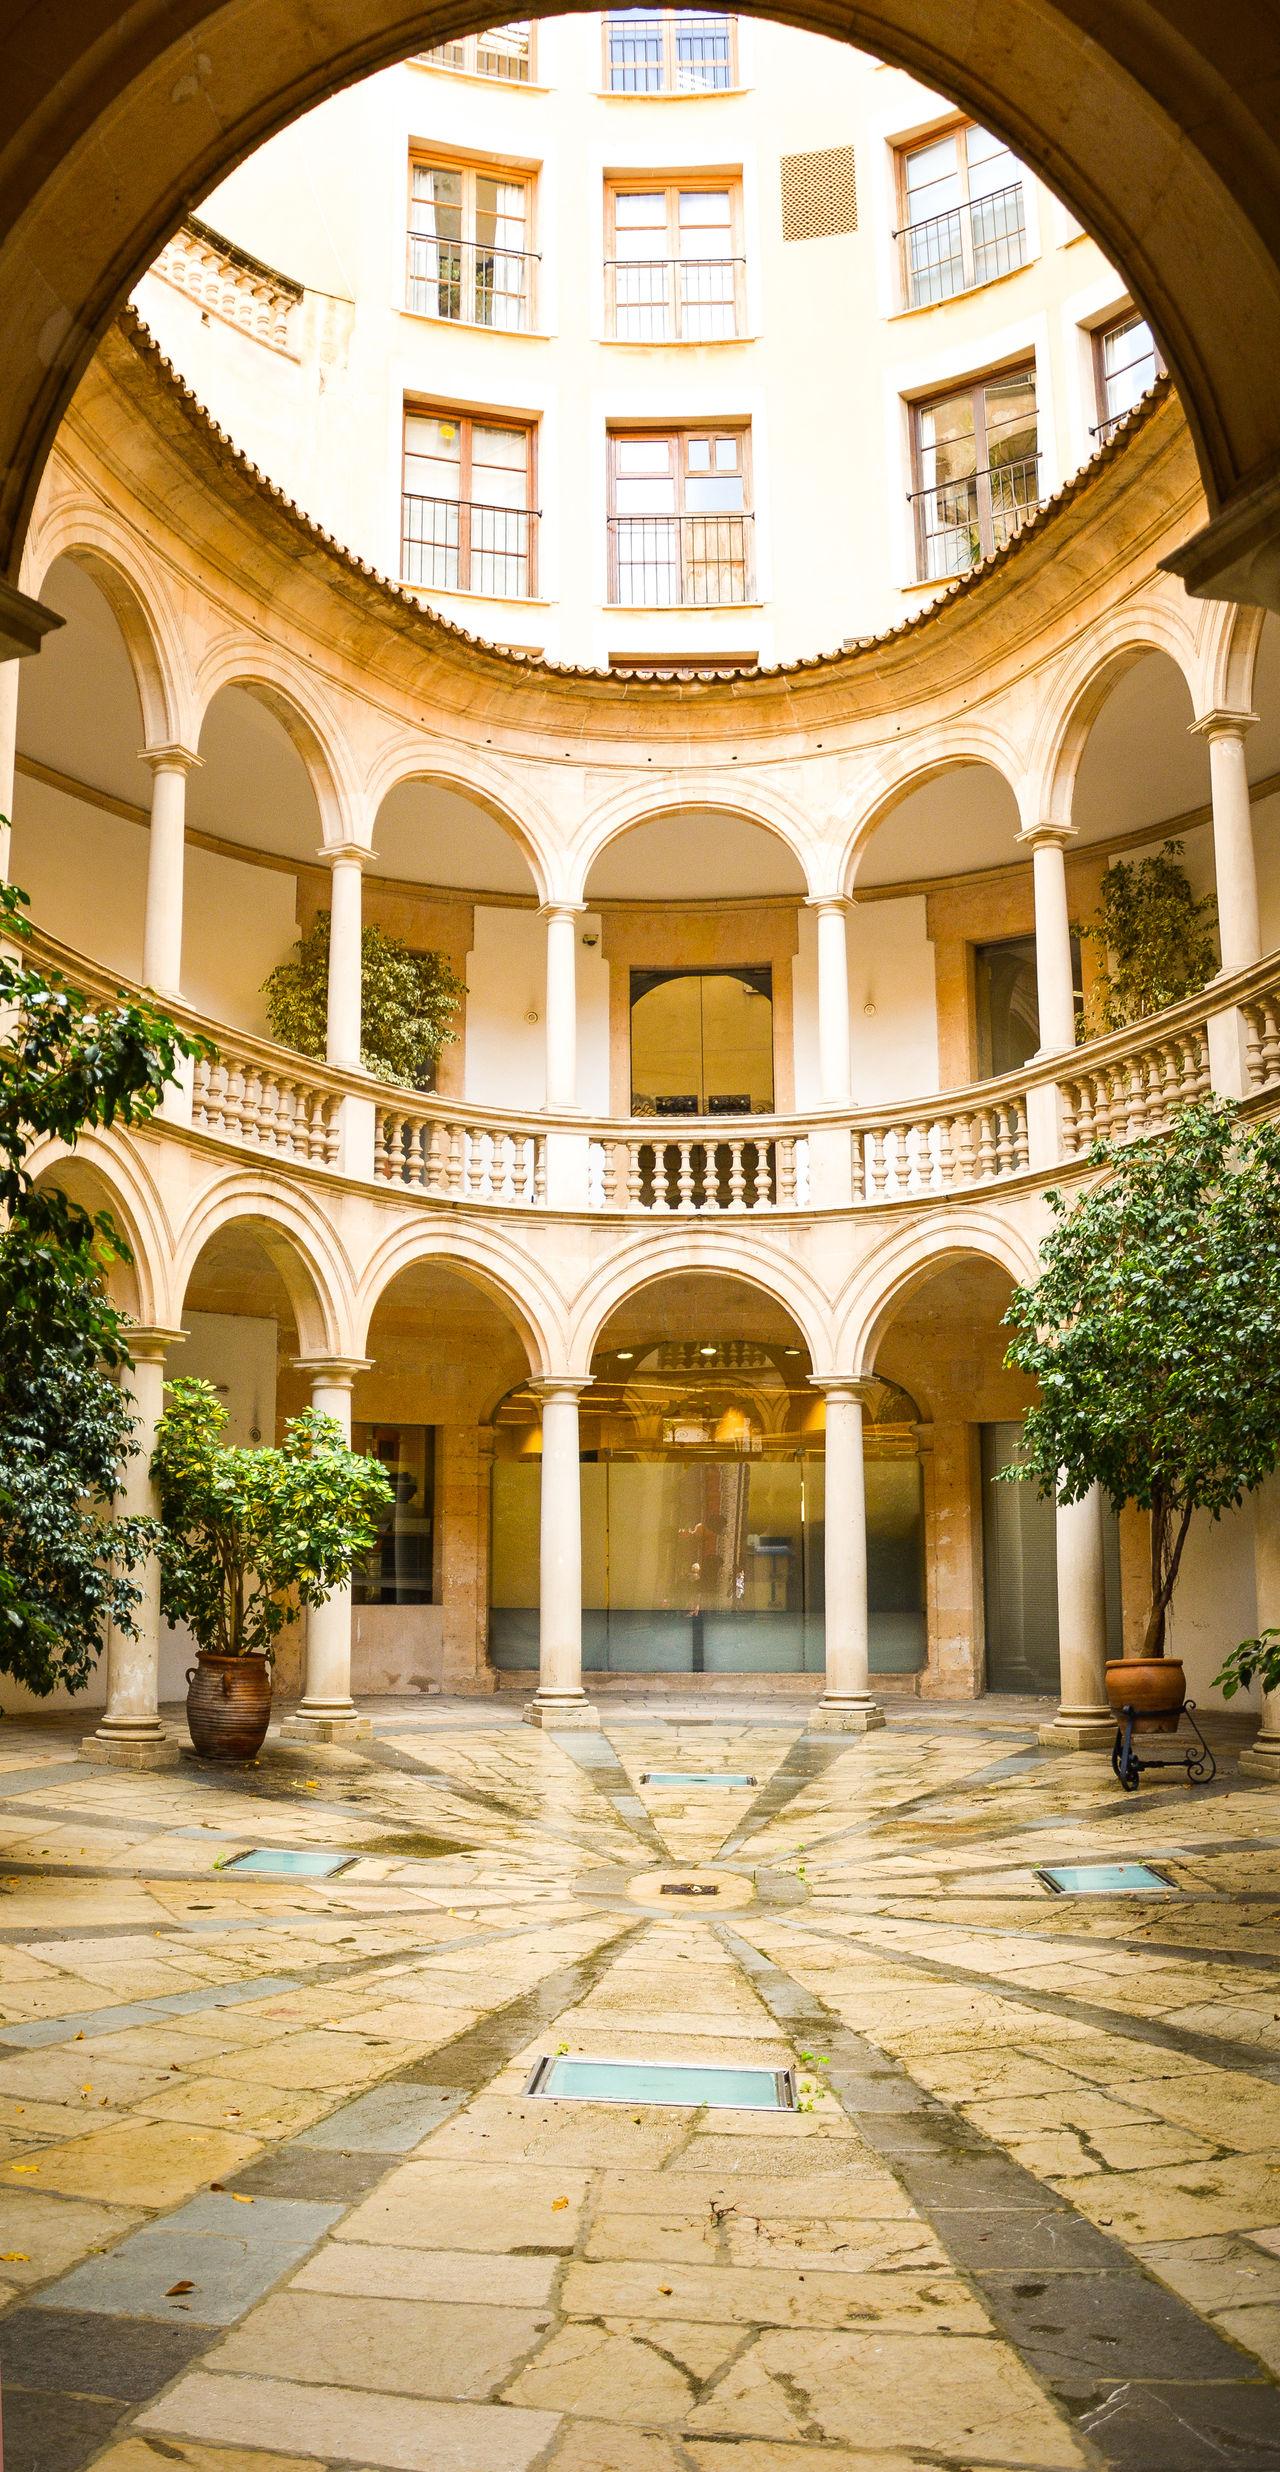 EyeEmNewHere First Eyeem Photo Architecture Mallorca Palma Interior Interior Hall Hall Bright Lovely Tower Arch Symmetry Balcony Inner Balcony